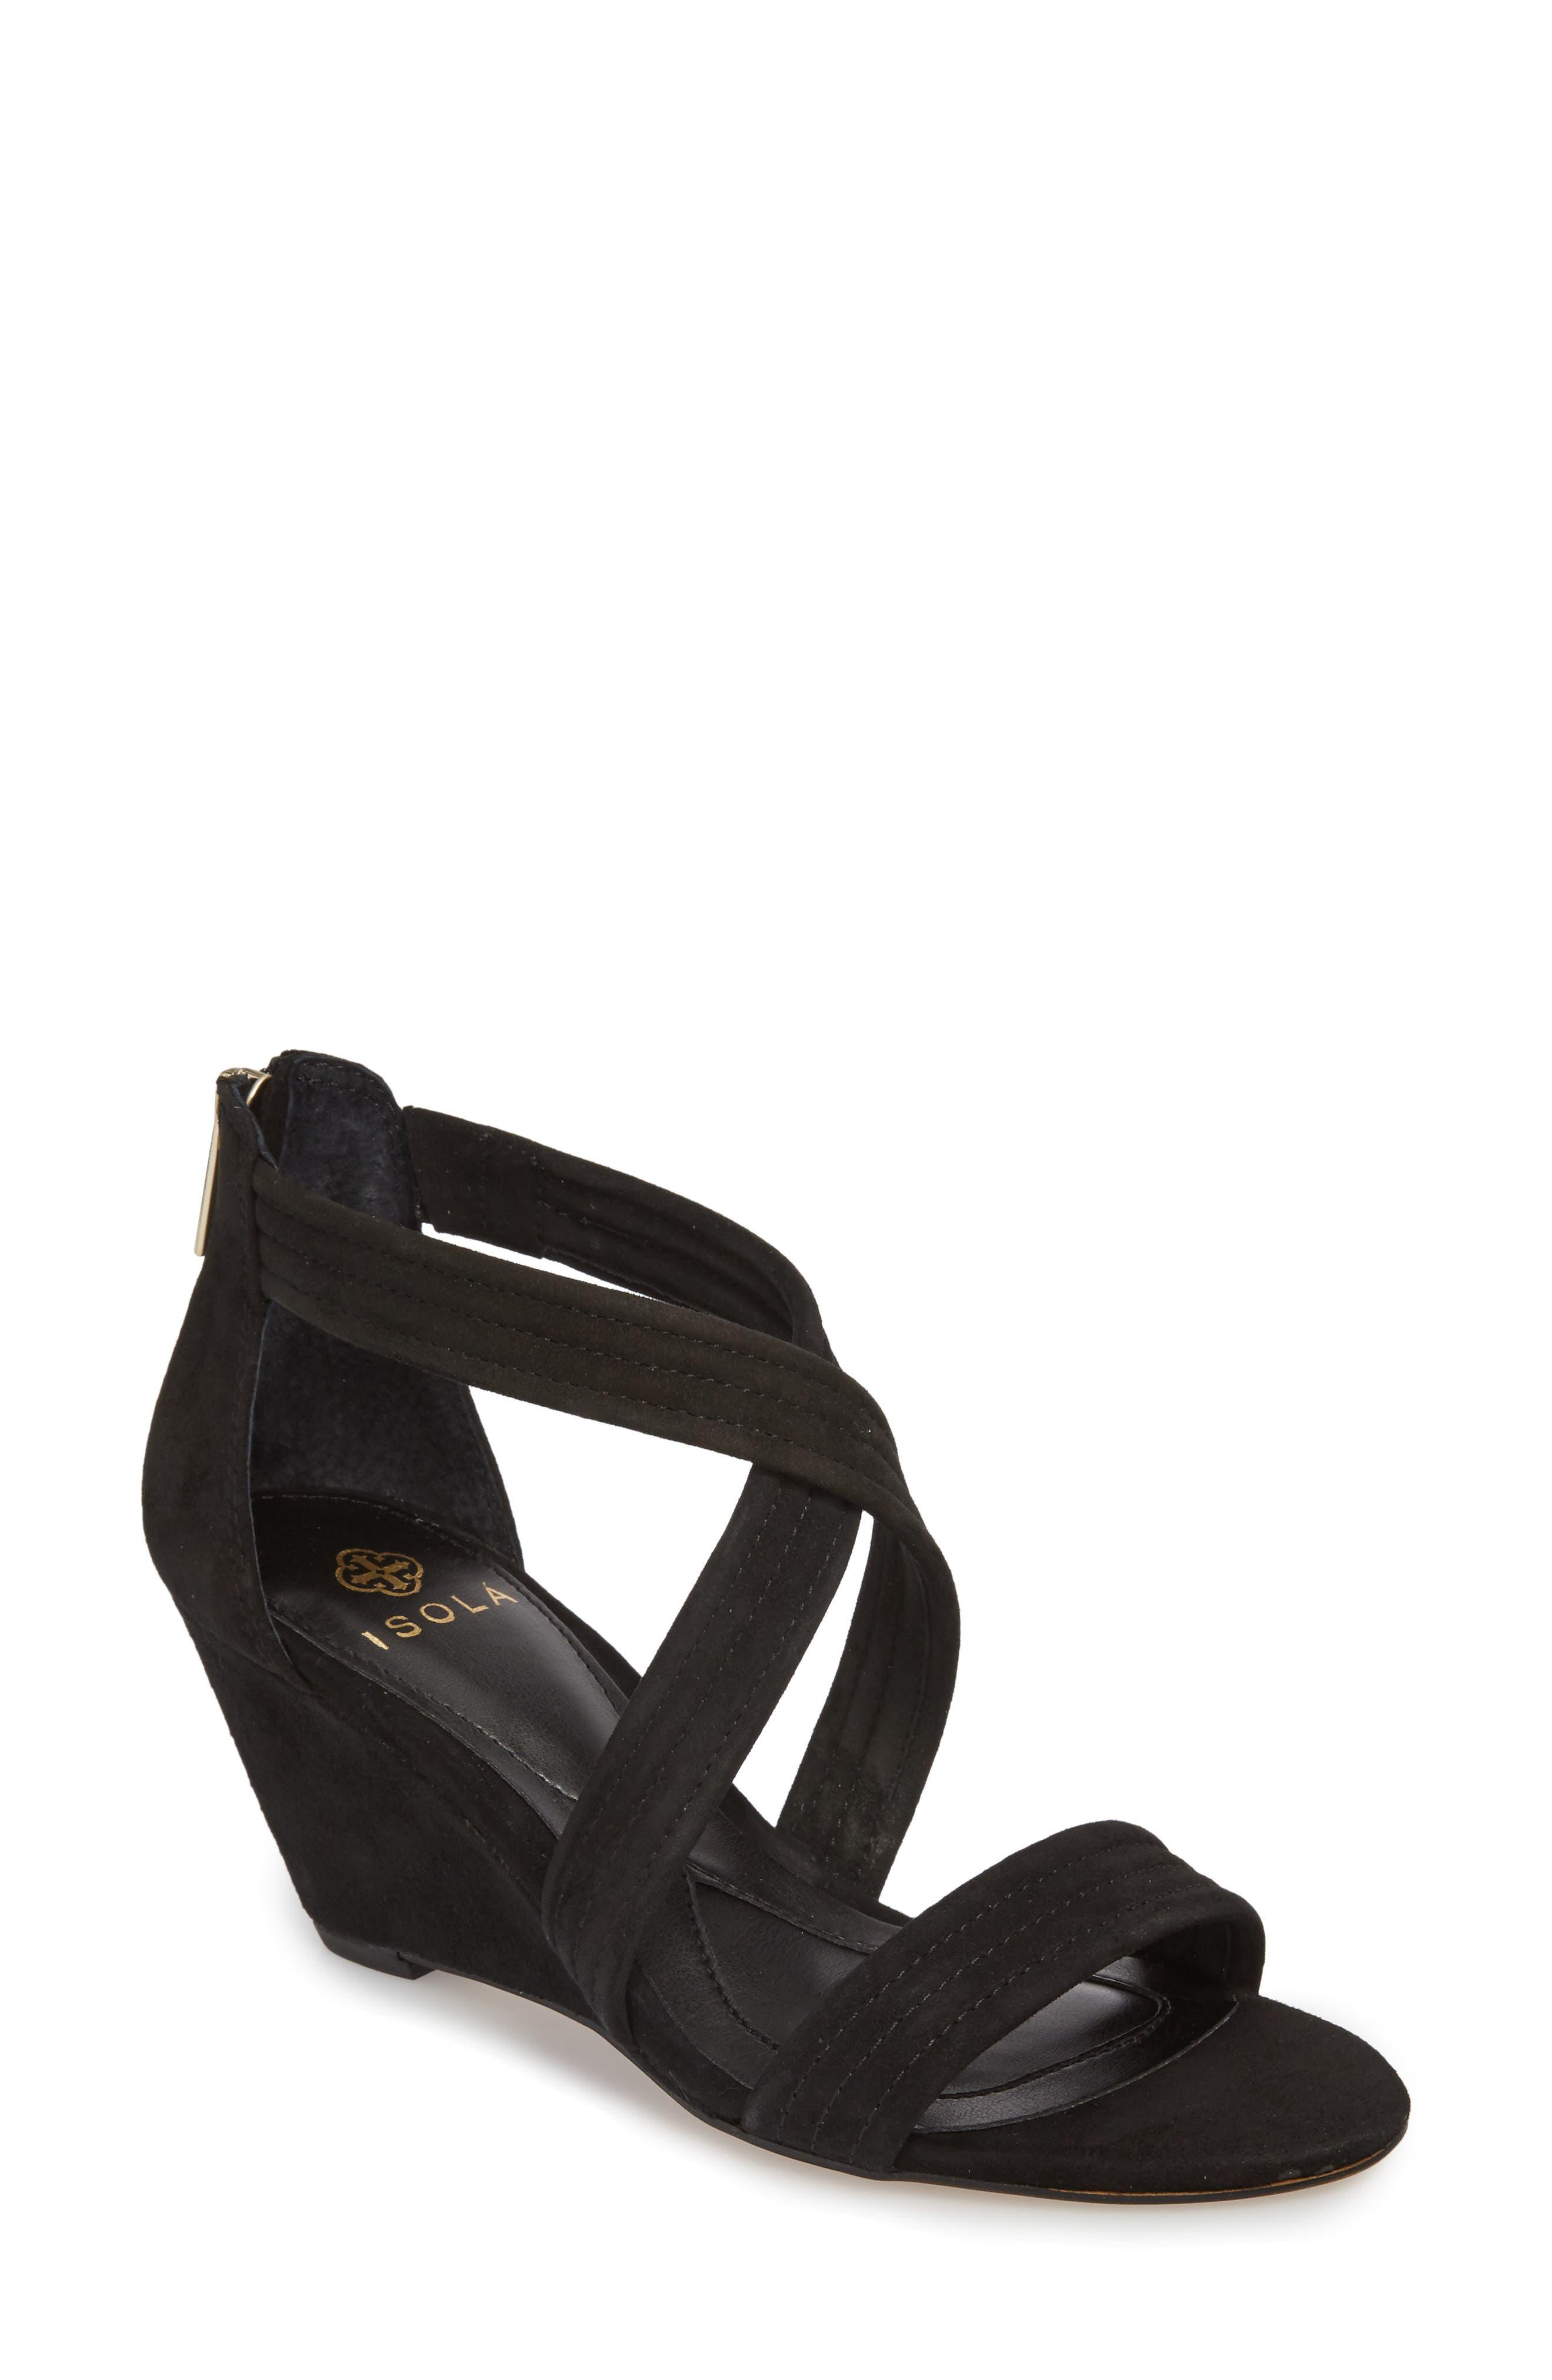 ISOLÁ Fia Wedge Sandal, Main, color, BLACK SUEDE